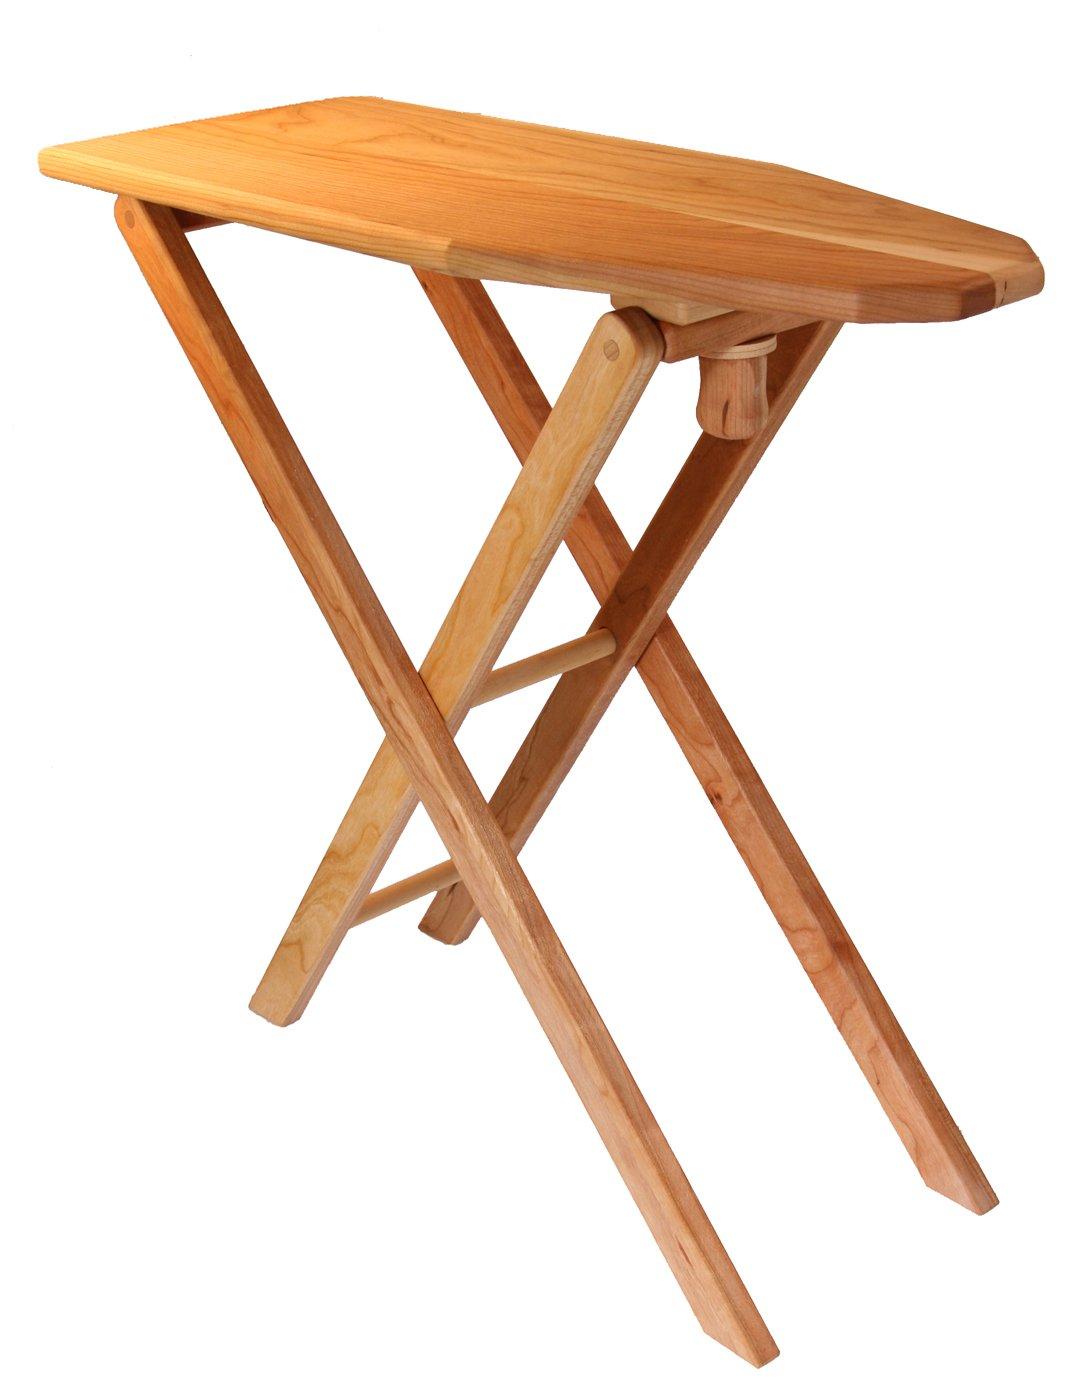 Camden Rose Child's Cherry Wood Play Ironing Board